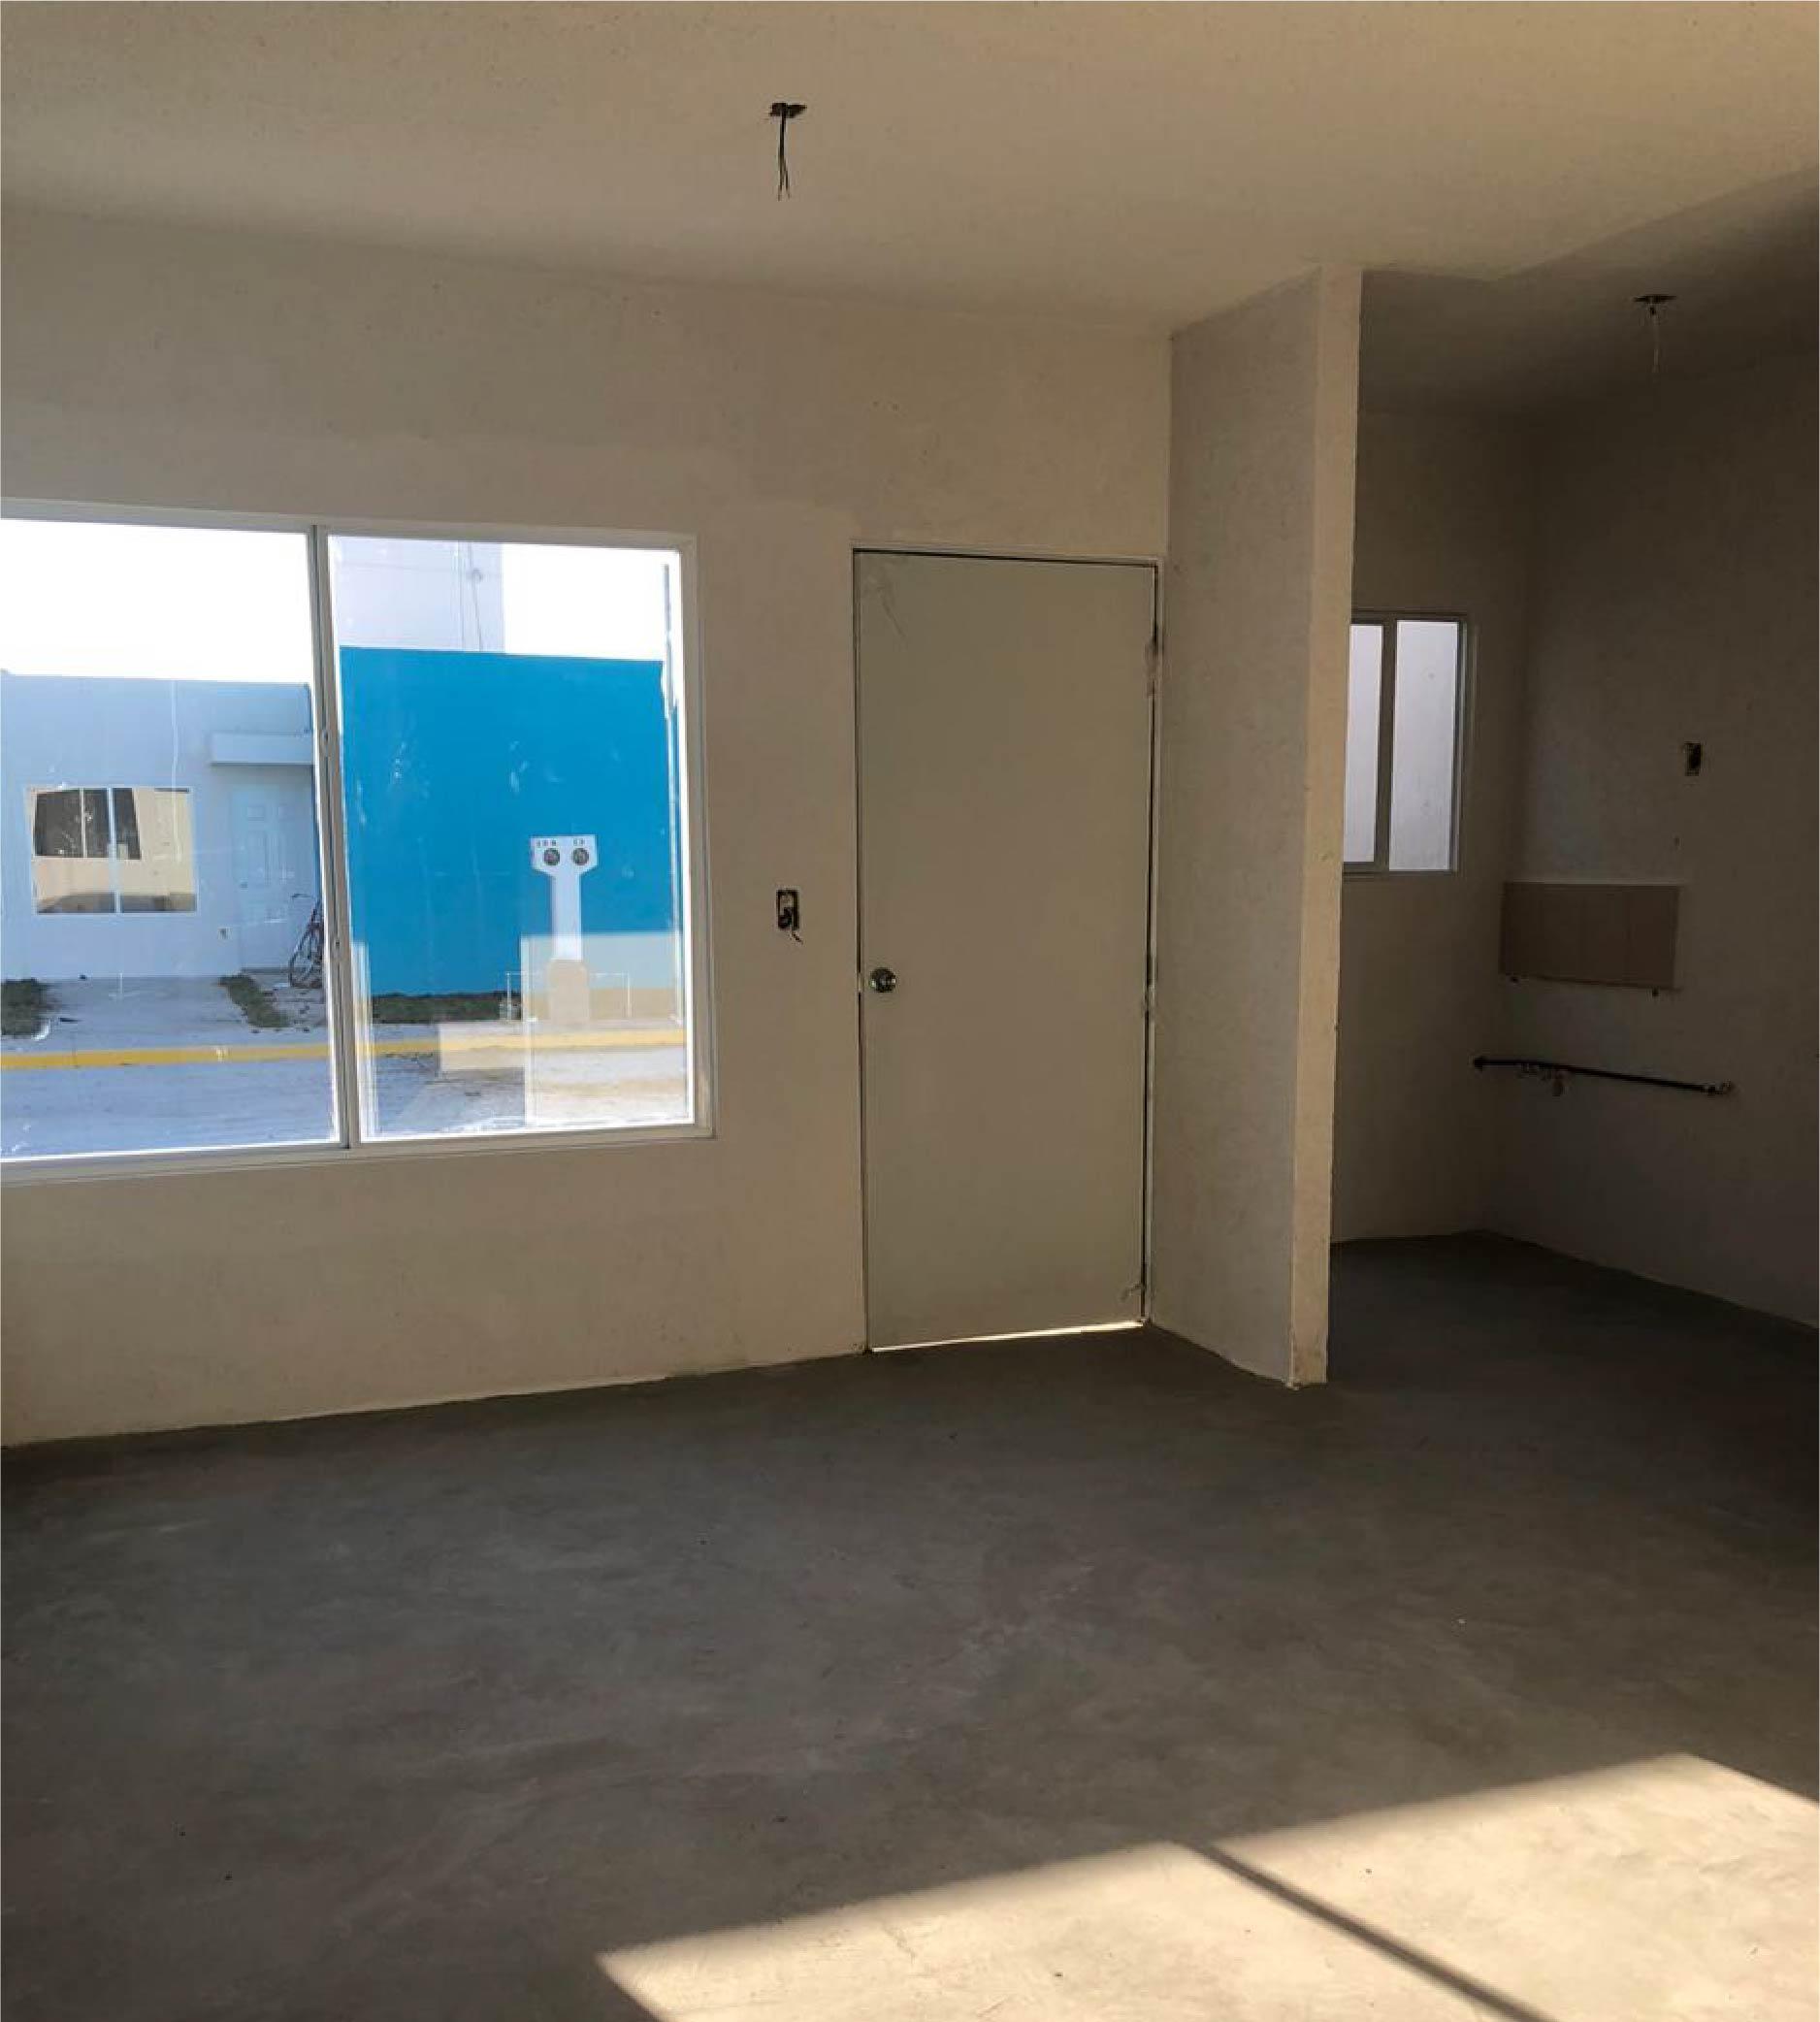 VILLA ARAGONEZ- C09 CELAYA- venta de casas infonavit en celaya-16